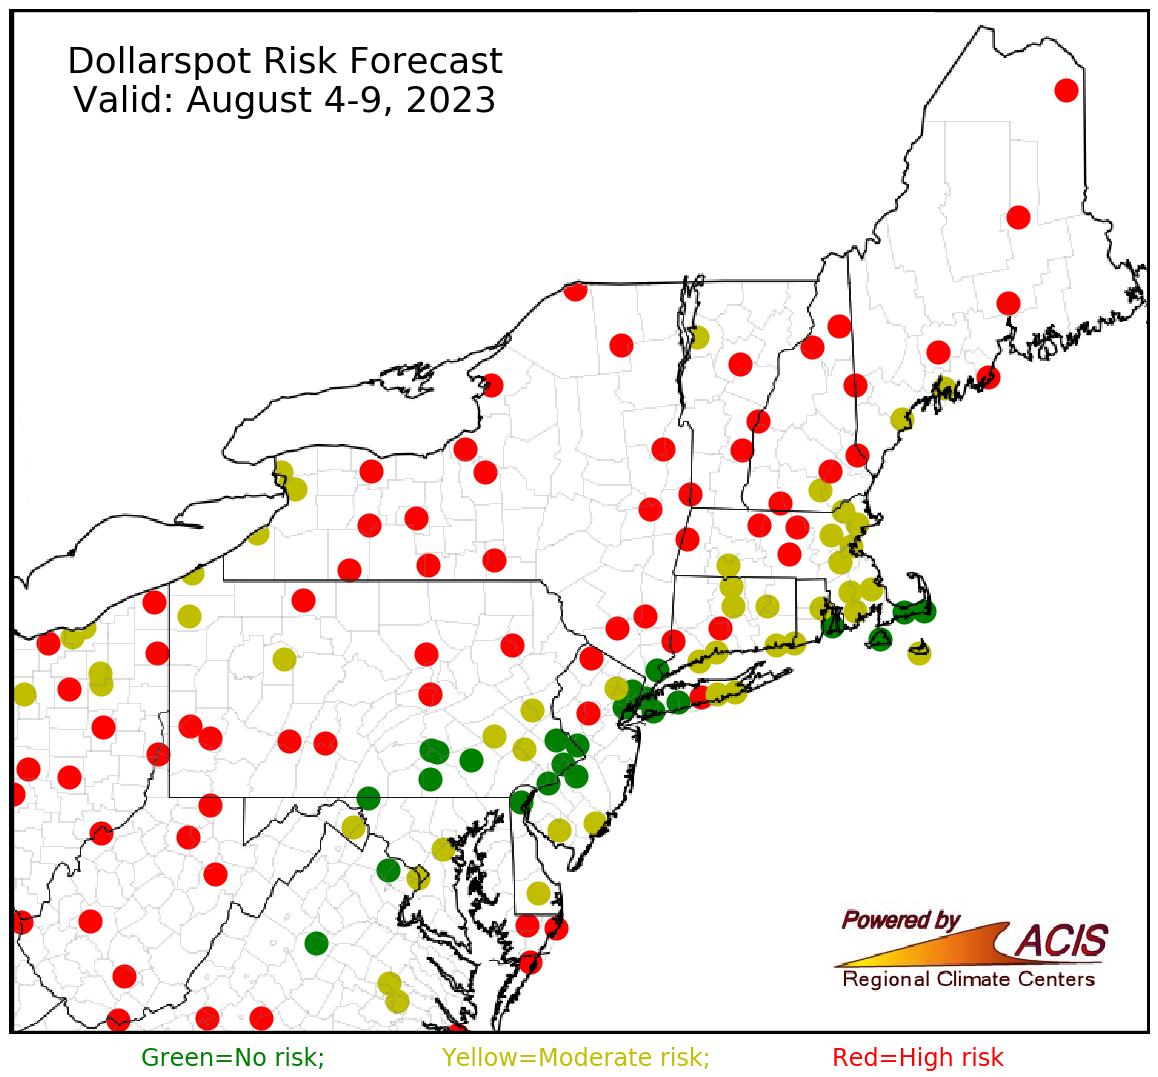 dollarspot forecast